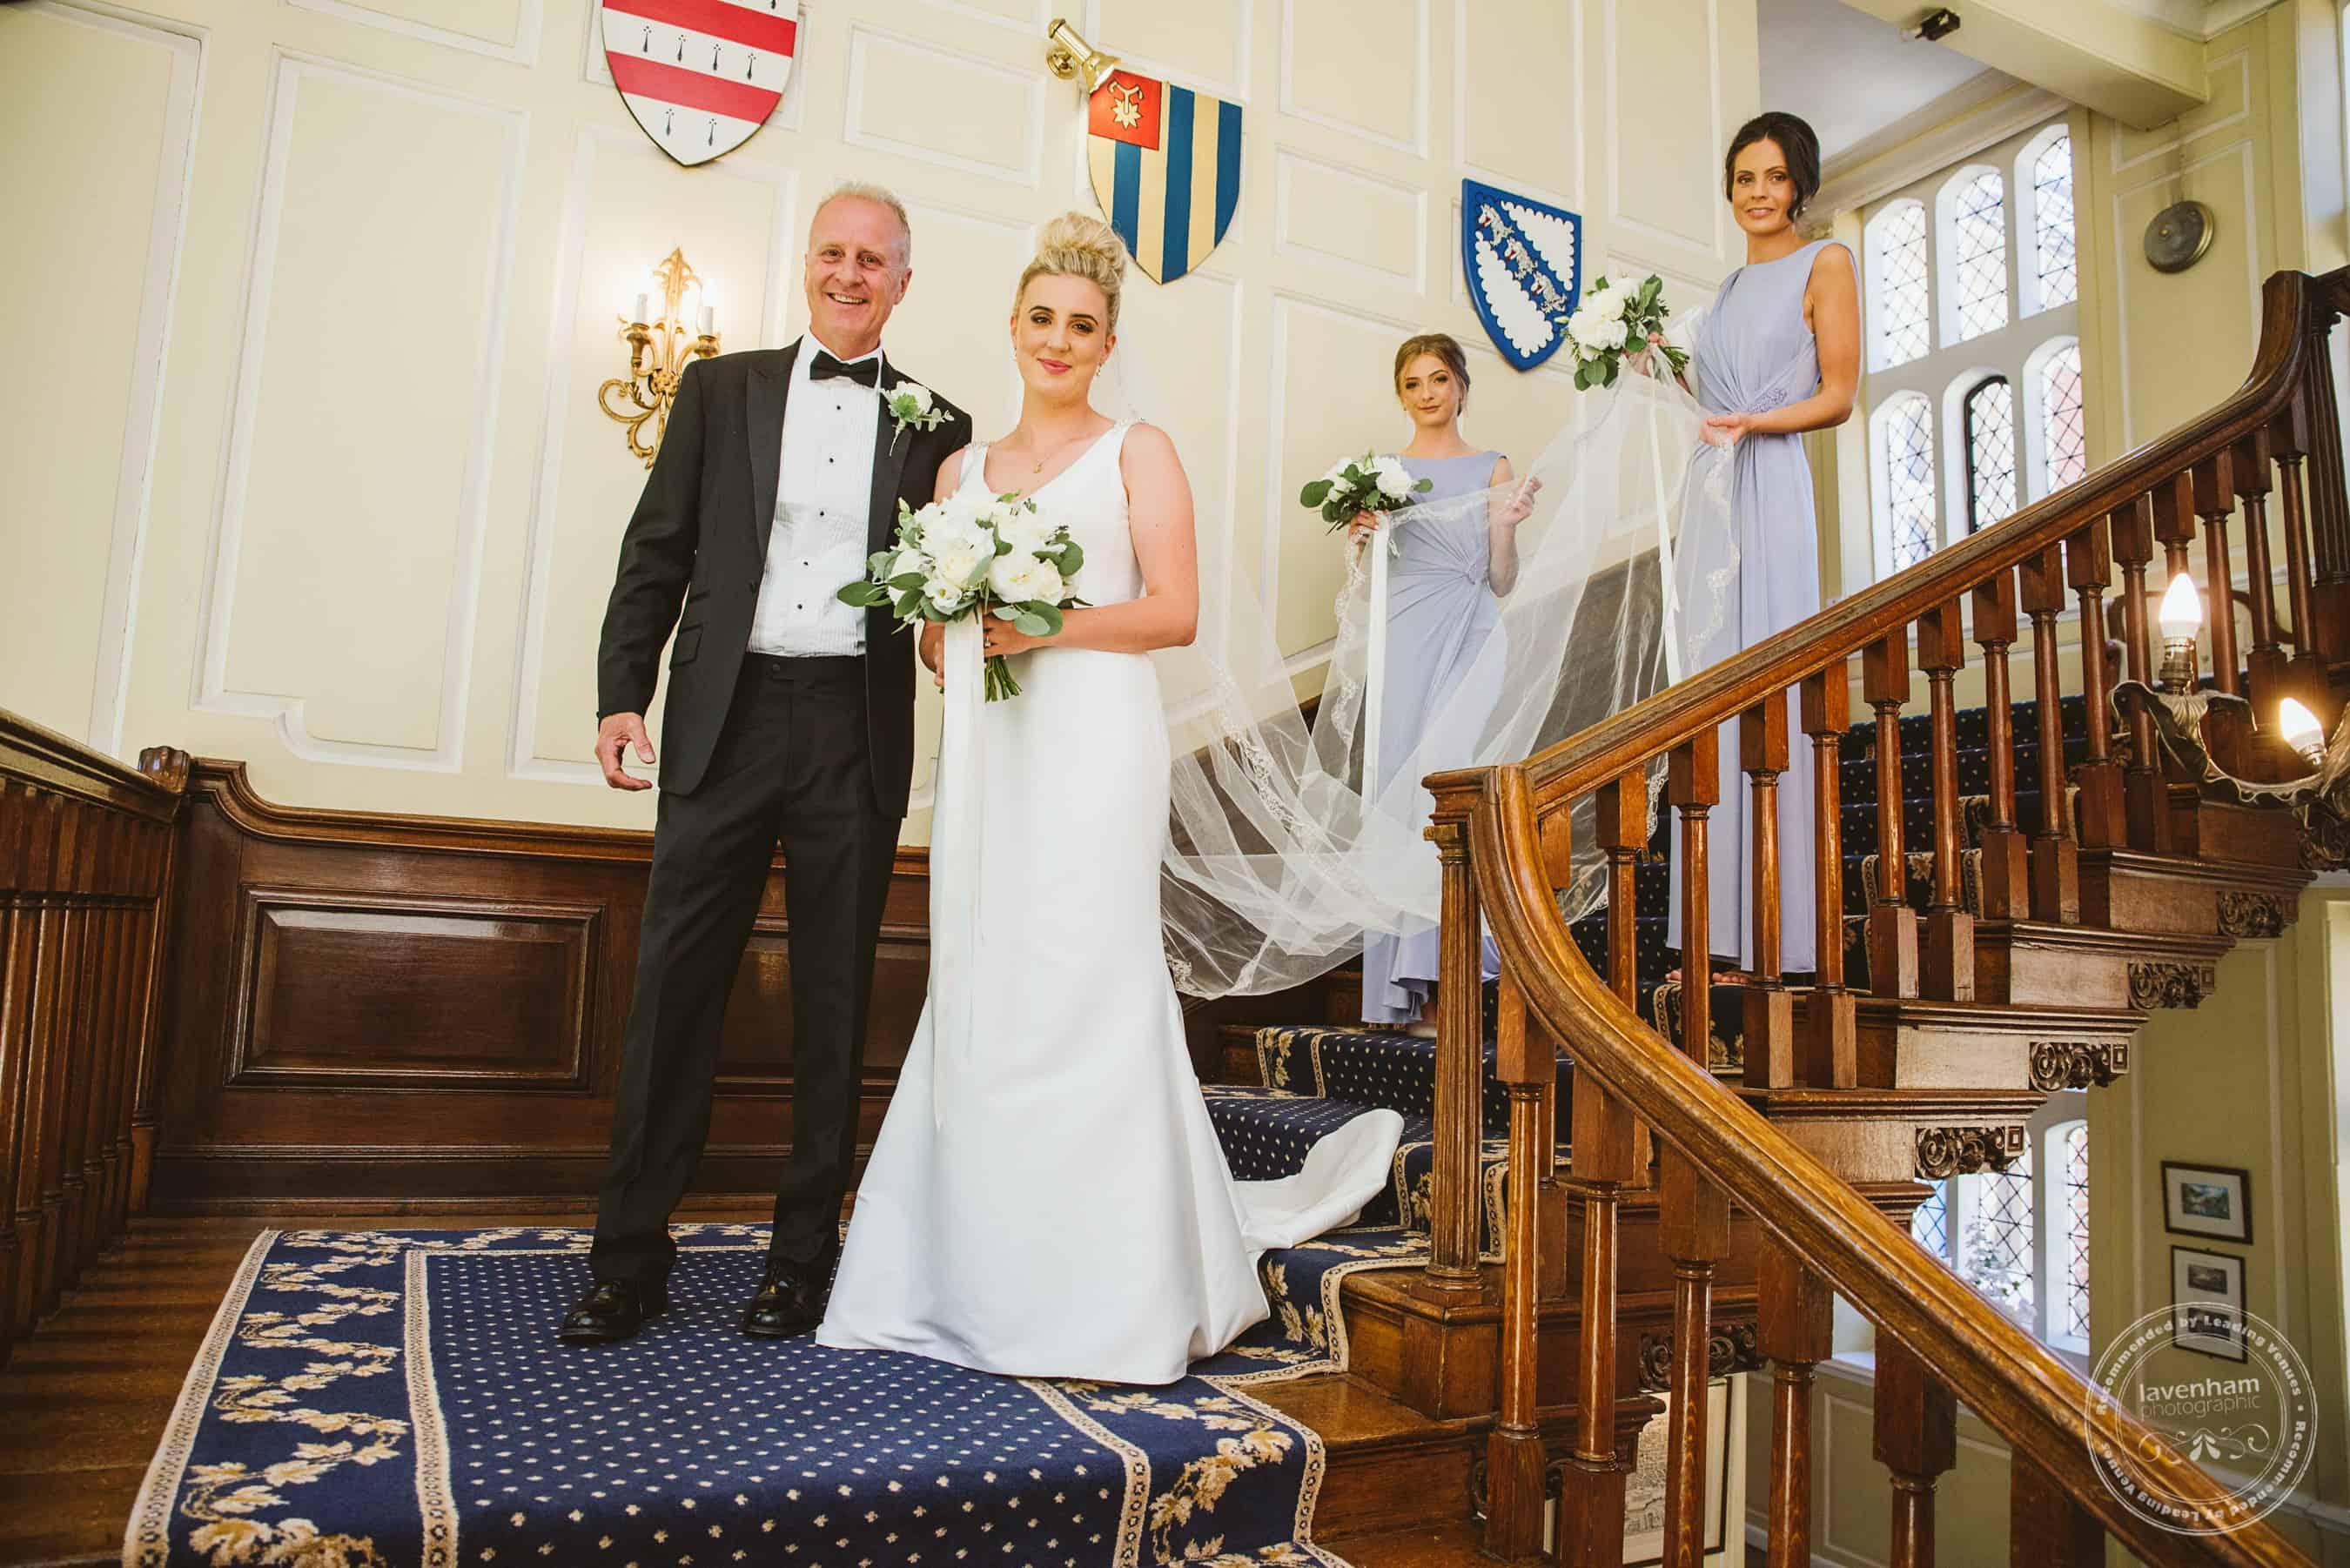 220618 Gosfield Hall Wedding Photography Lavenham Photographic 0064